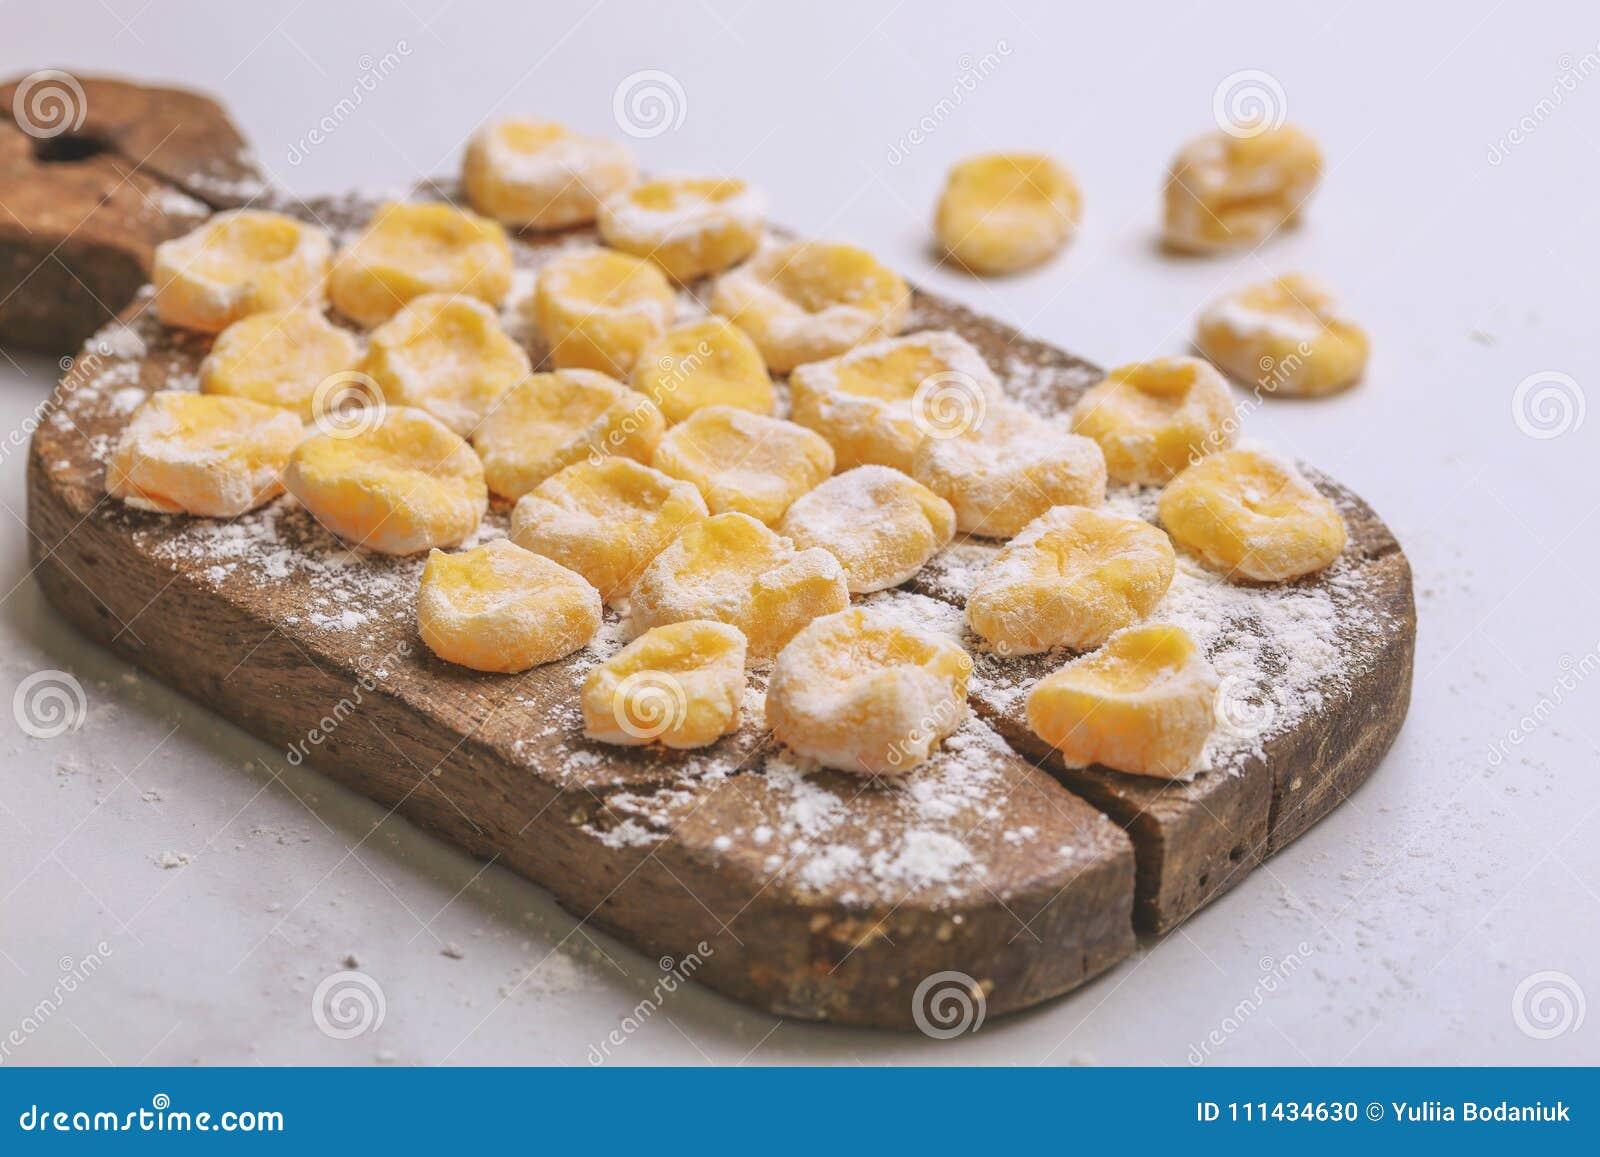 Italian uncooked homemade potato gnocchi with flour.